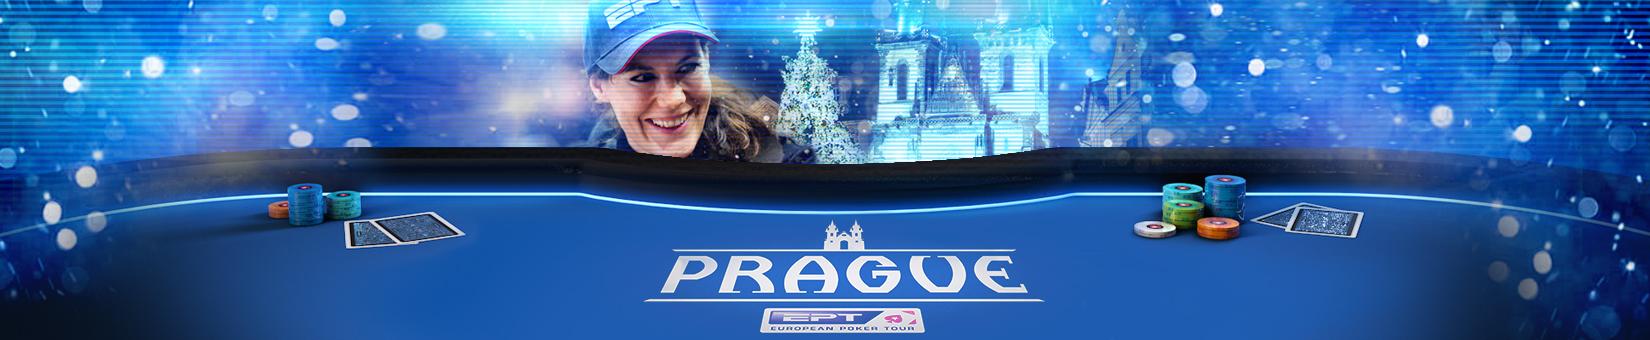 EPT Praga 2020